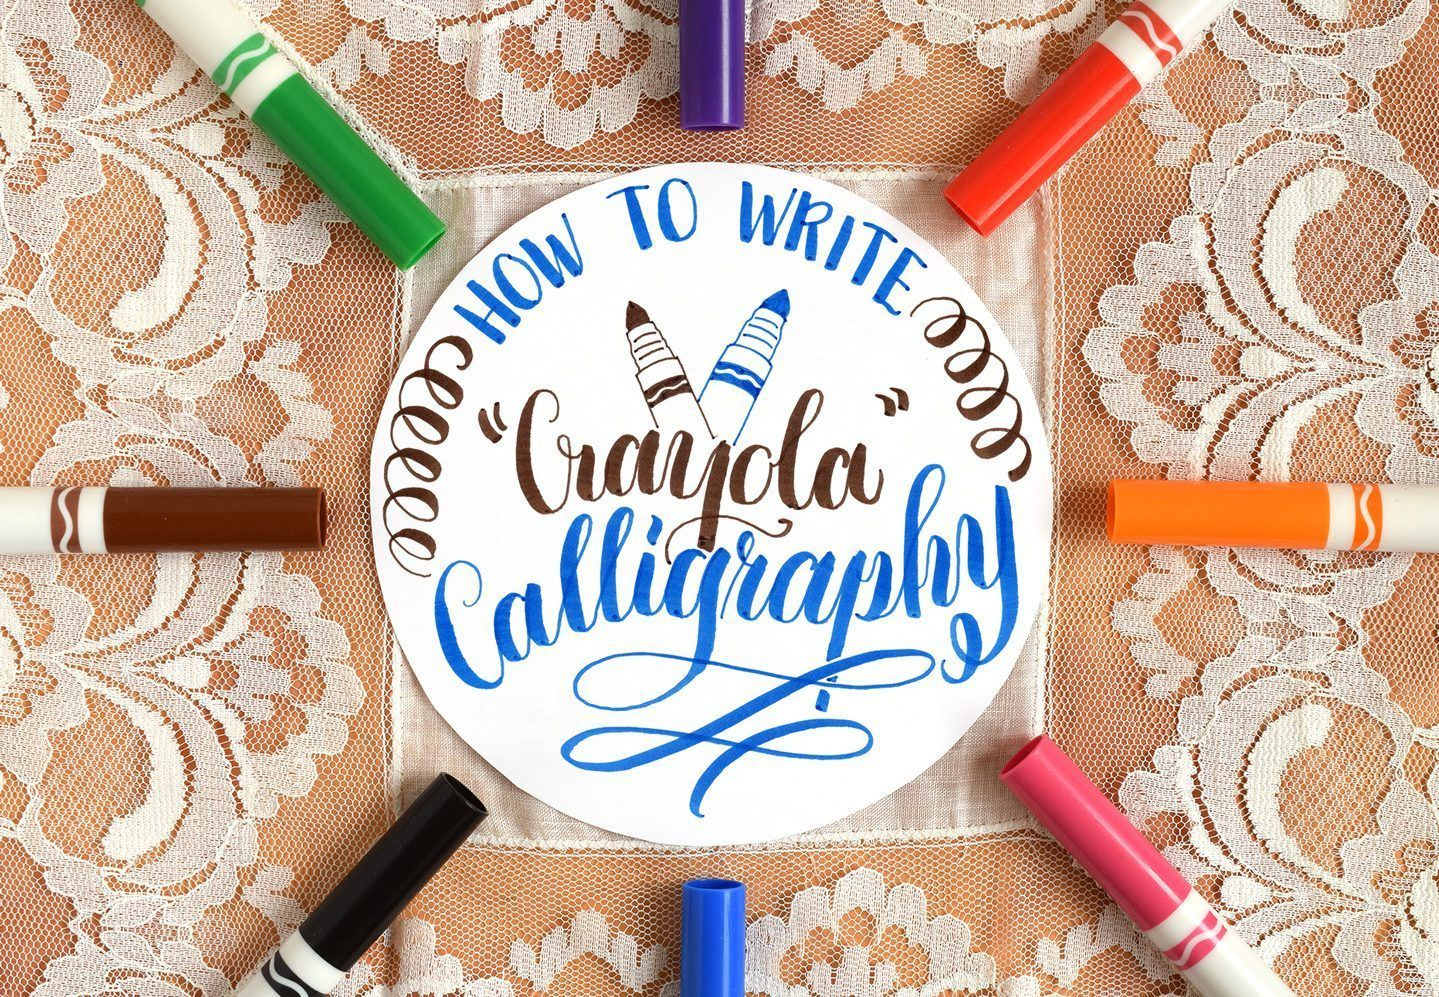 How To Write Crayola Calligraphy